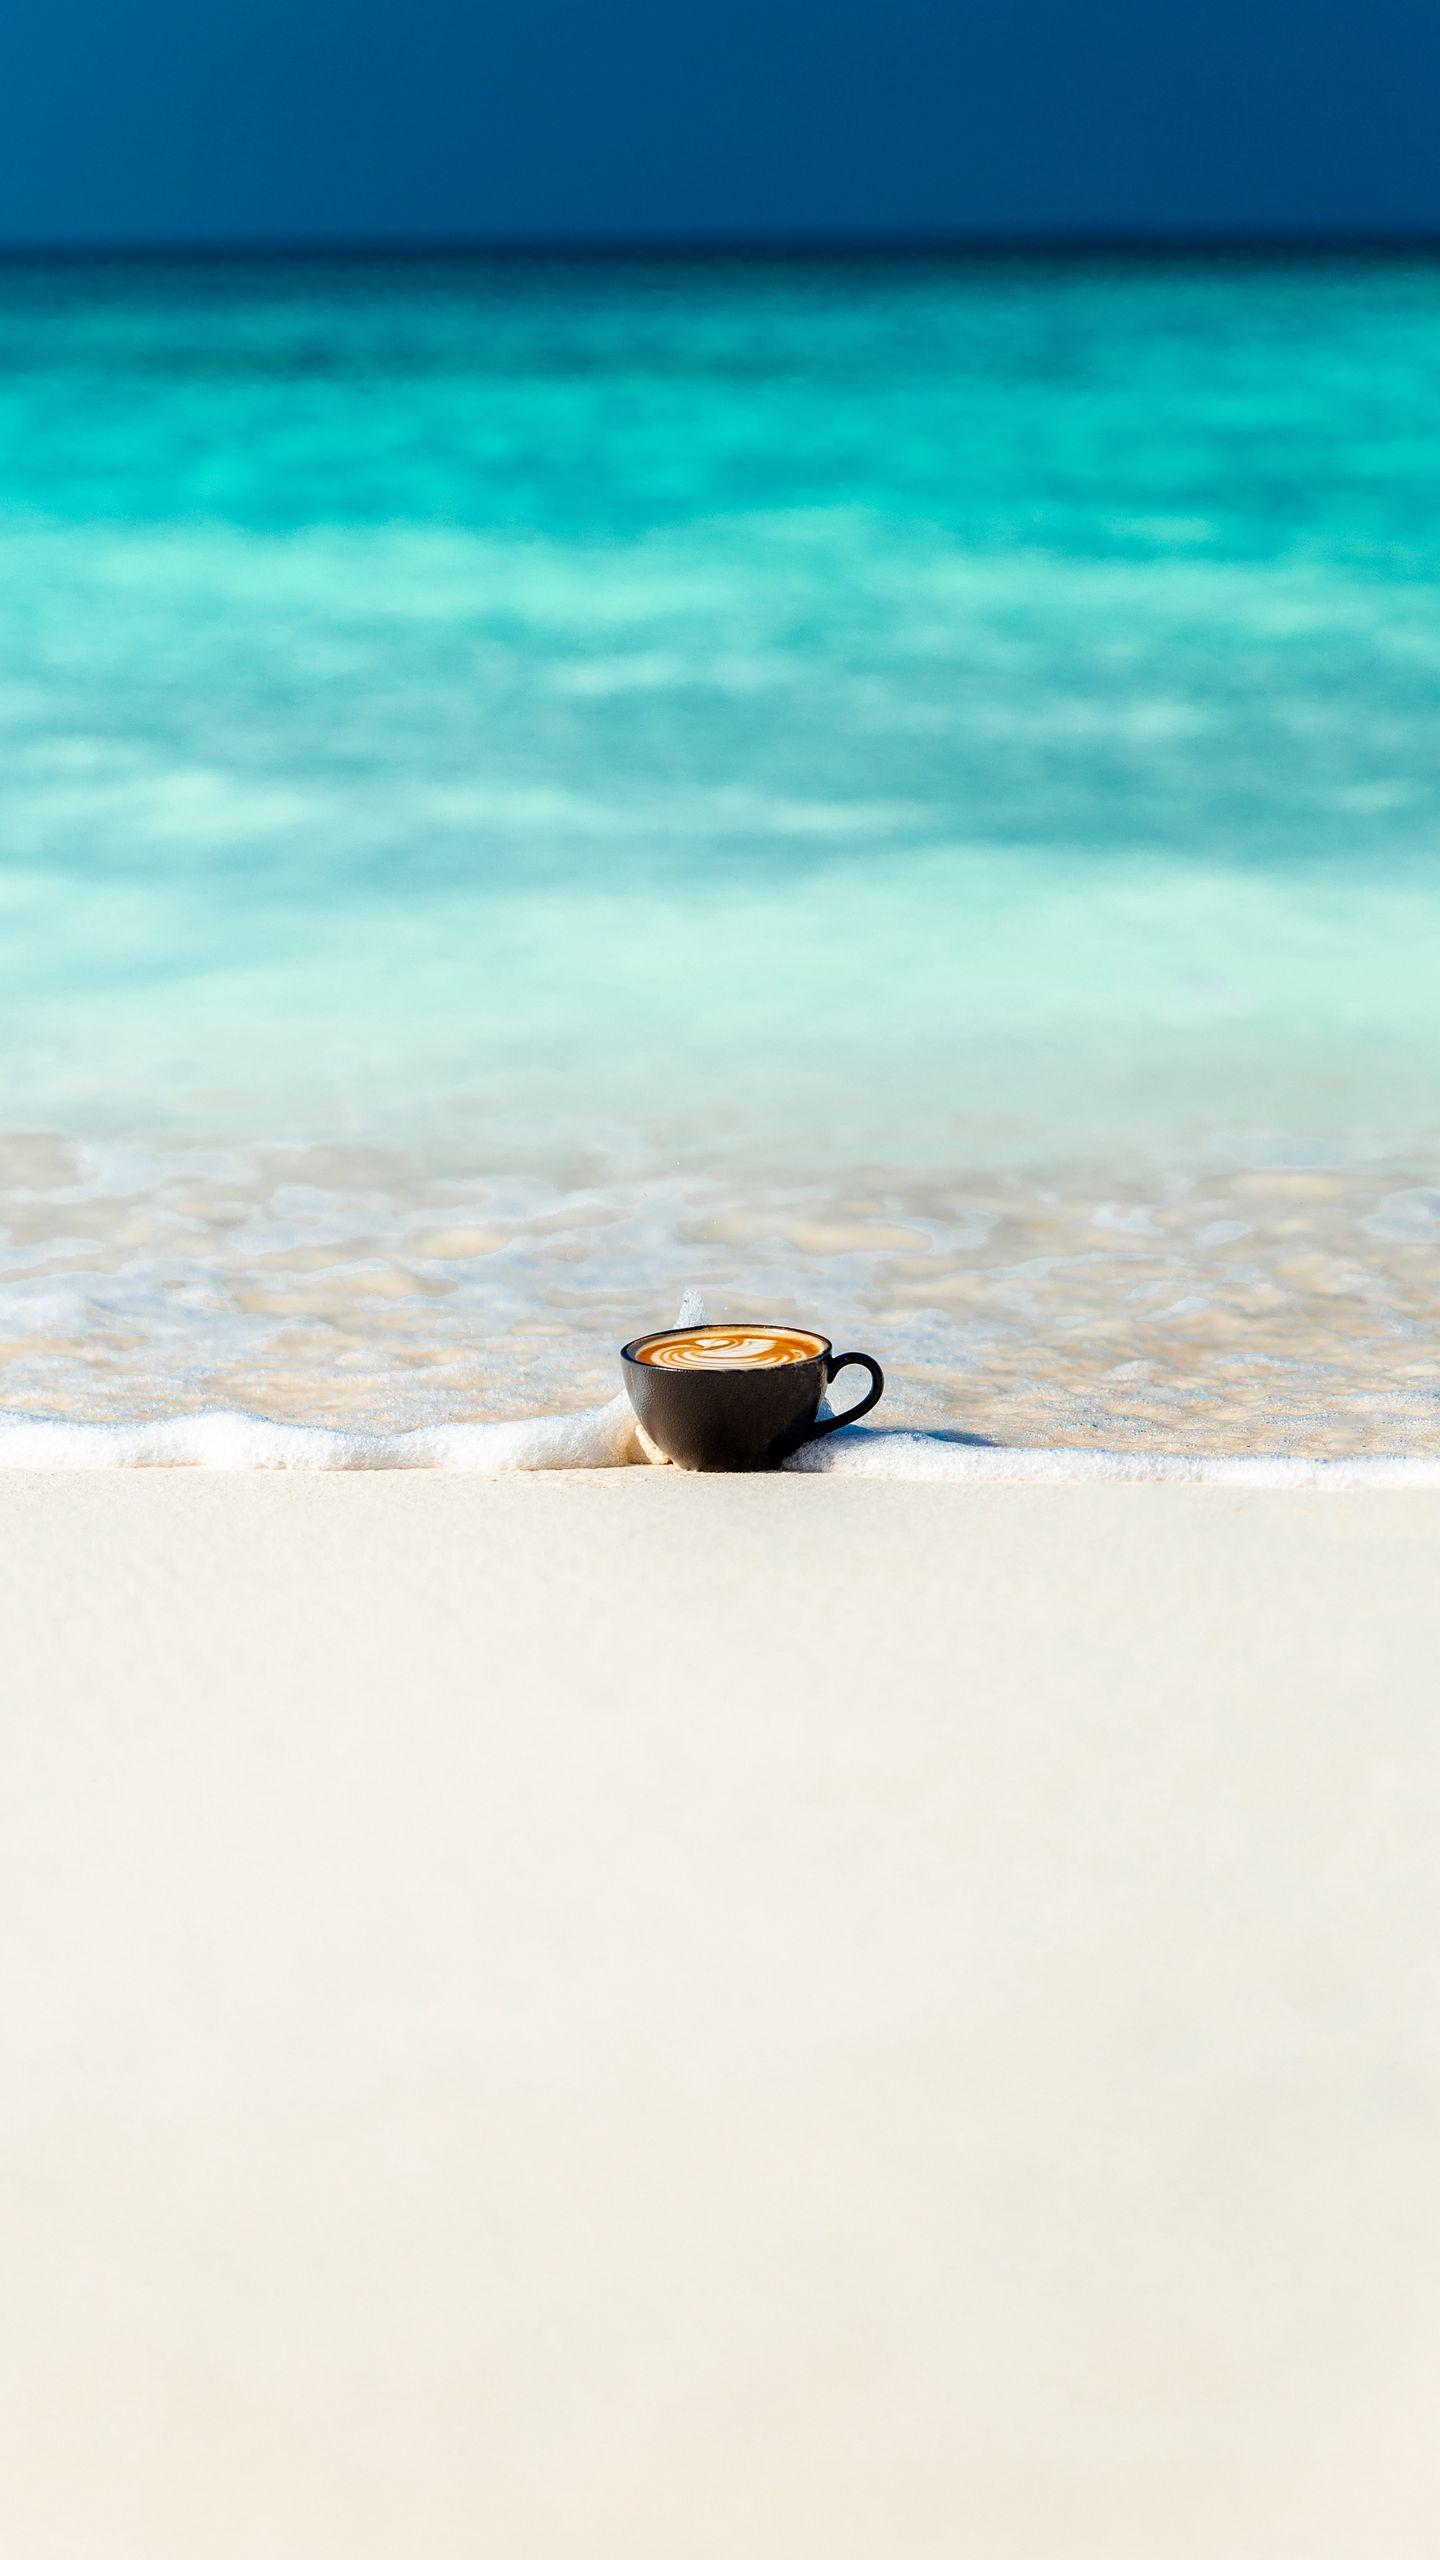 1440x2560 Wallpaper cup, ocean, sand, coast, minimalism